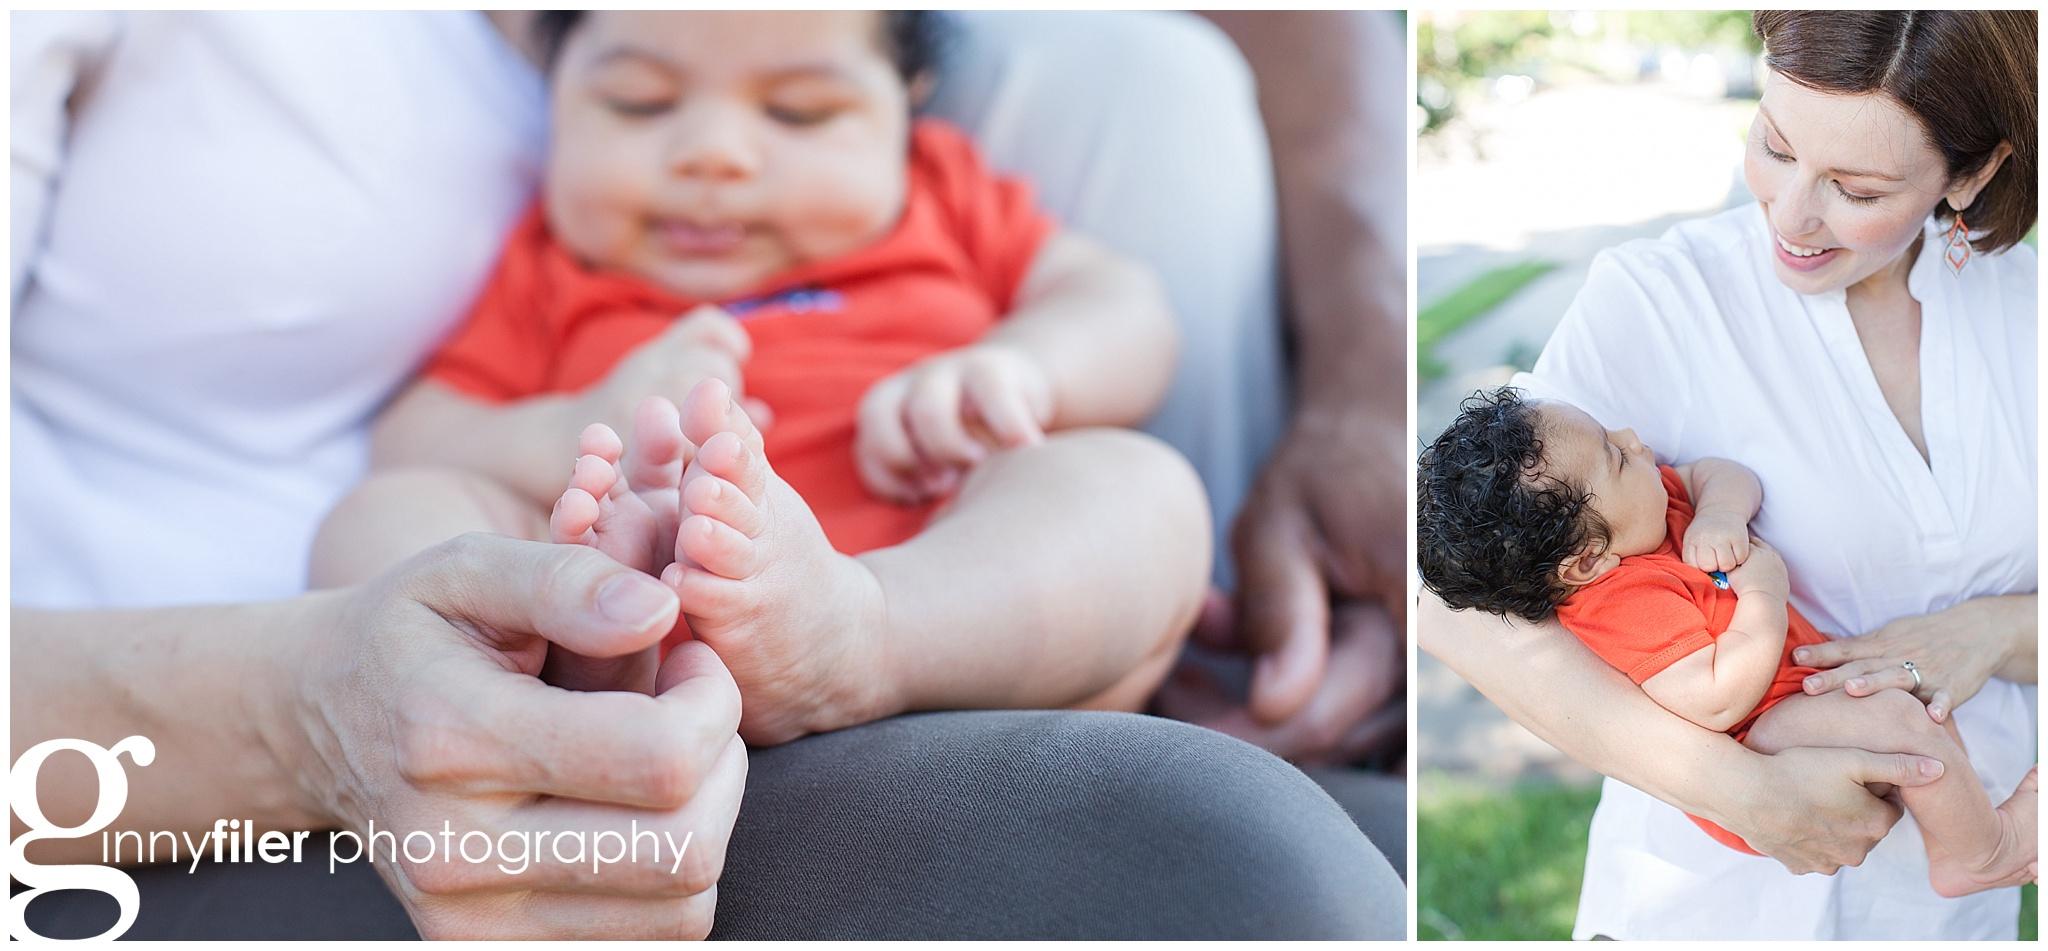 family_photography_newborn_0133.jpg